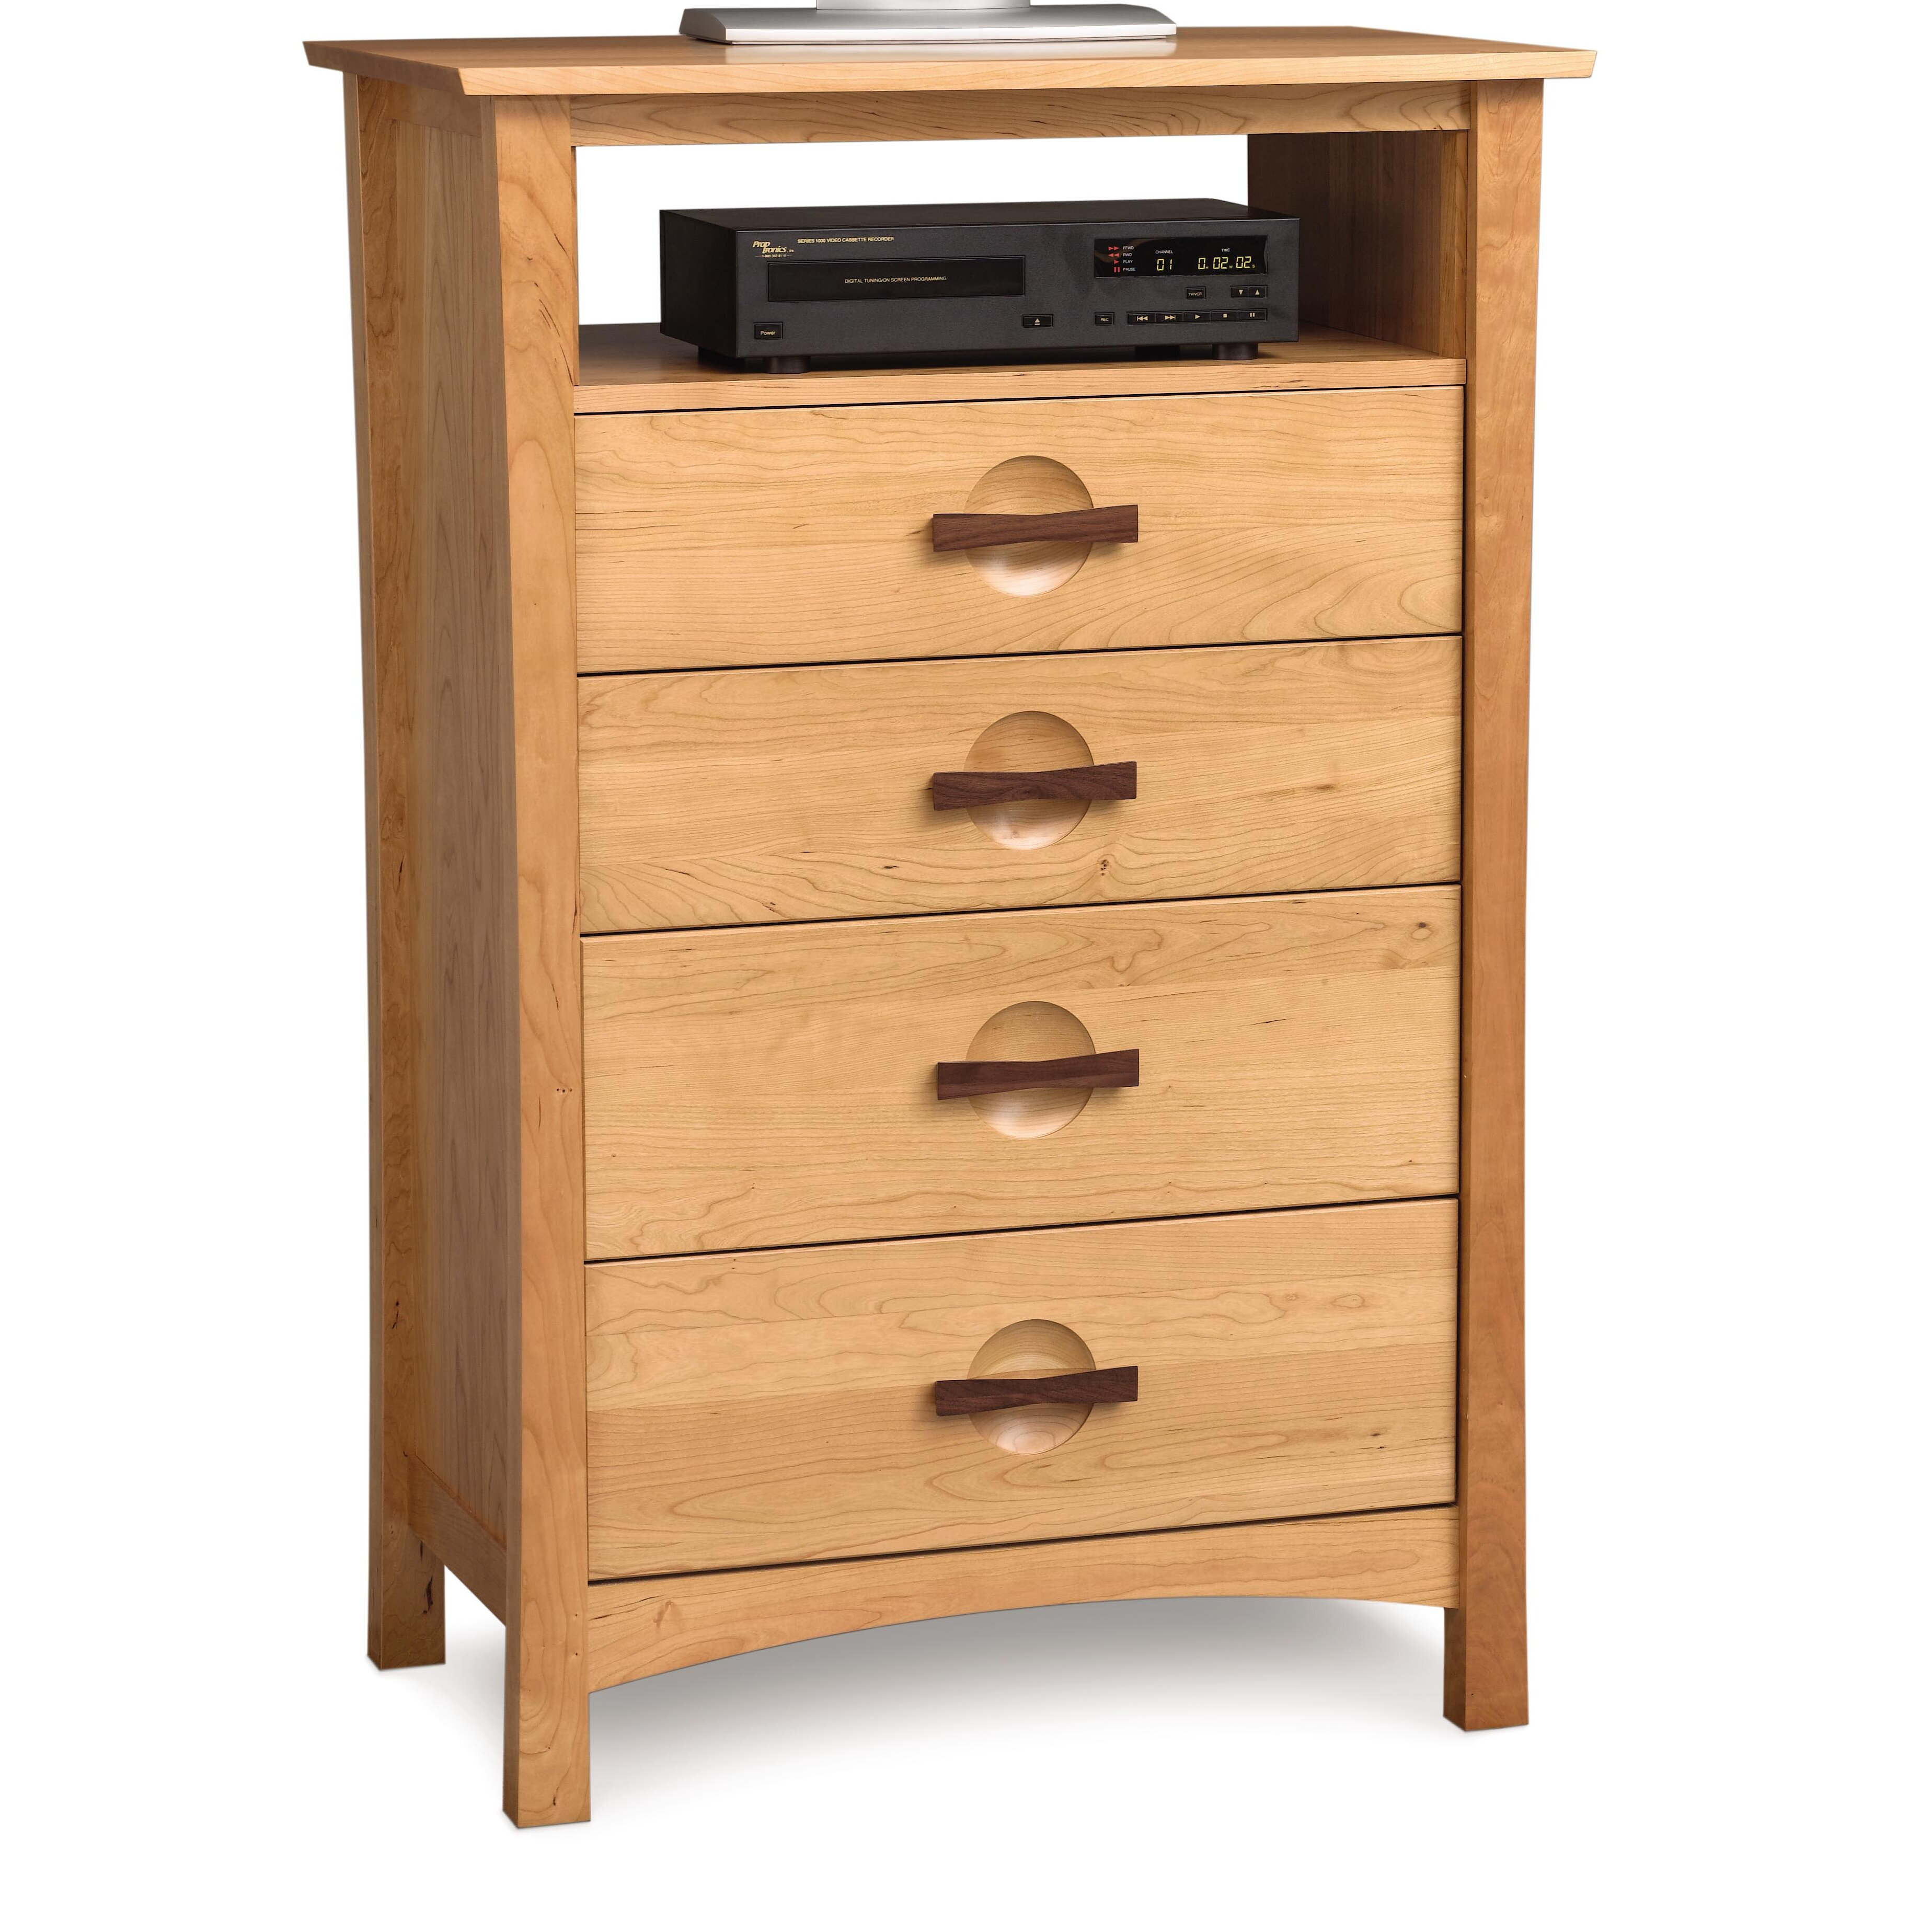 Copeland furniture berkeley platform customizable bedroom set reviews for Bedroom furniture berkeley ca